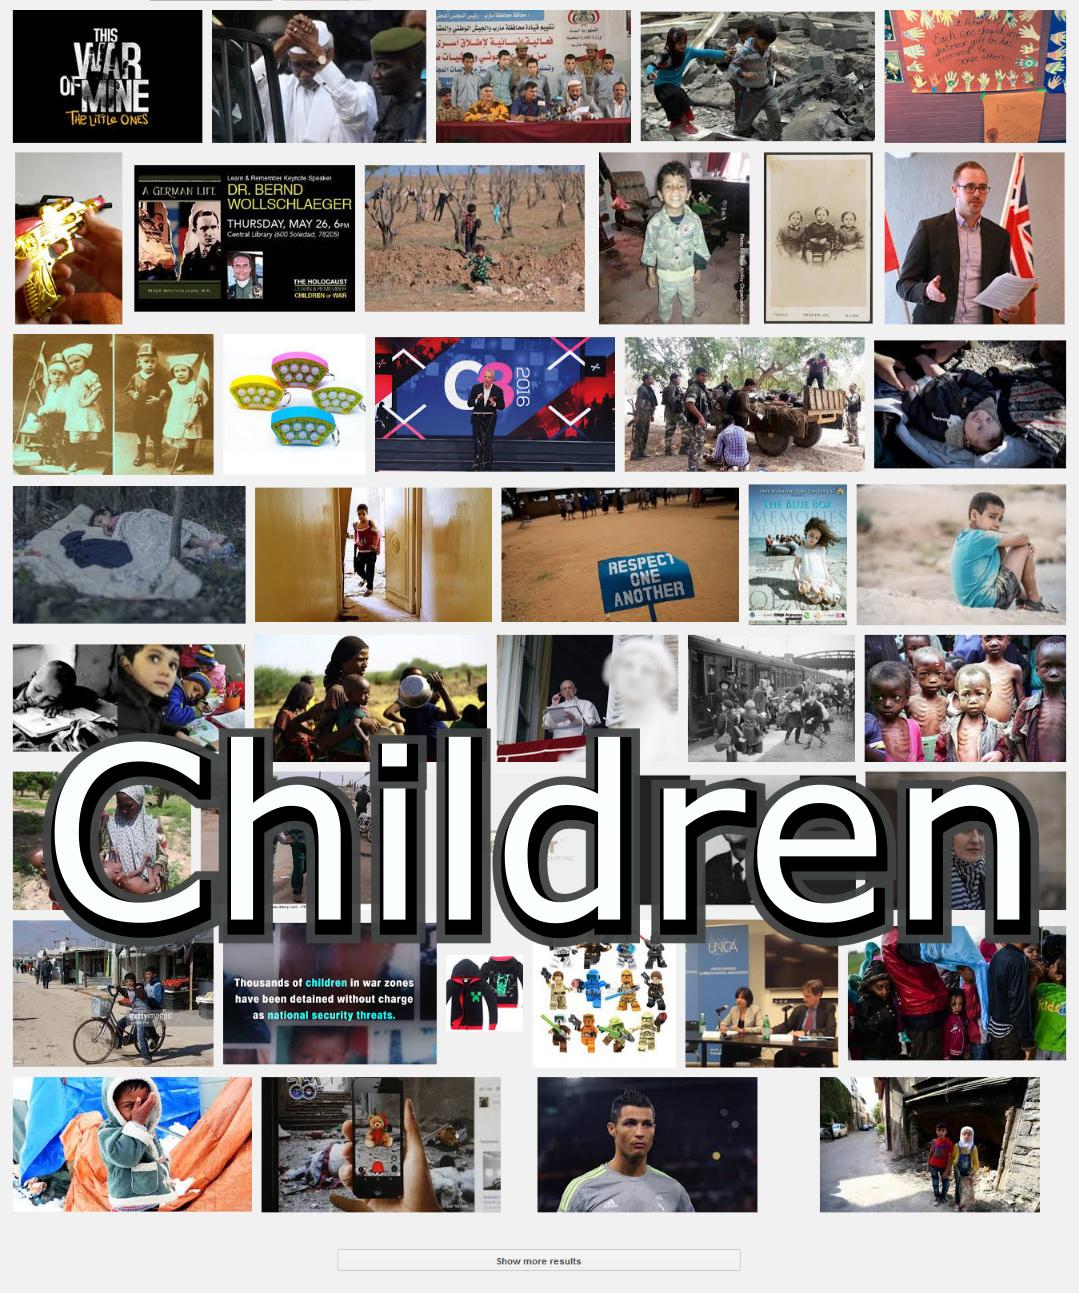 https://www.google.com/search?q=war+children+2016&safe=off&tbm=isch&tbo=u&source=univ&sa=X&ved=0ahUKEwjGxpXu7sPOAhUCzWMKHdnGBMUQsAQIHQ&biw=1366&bih=659